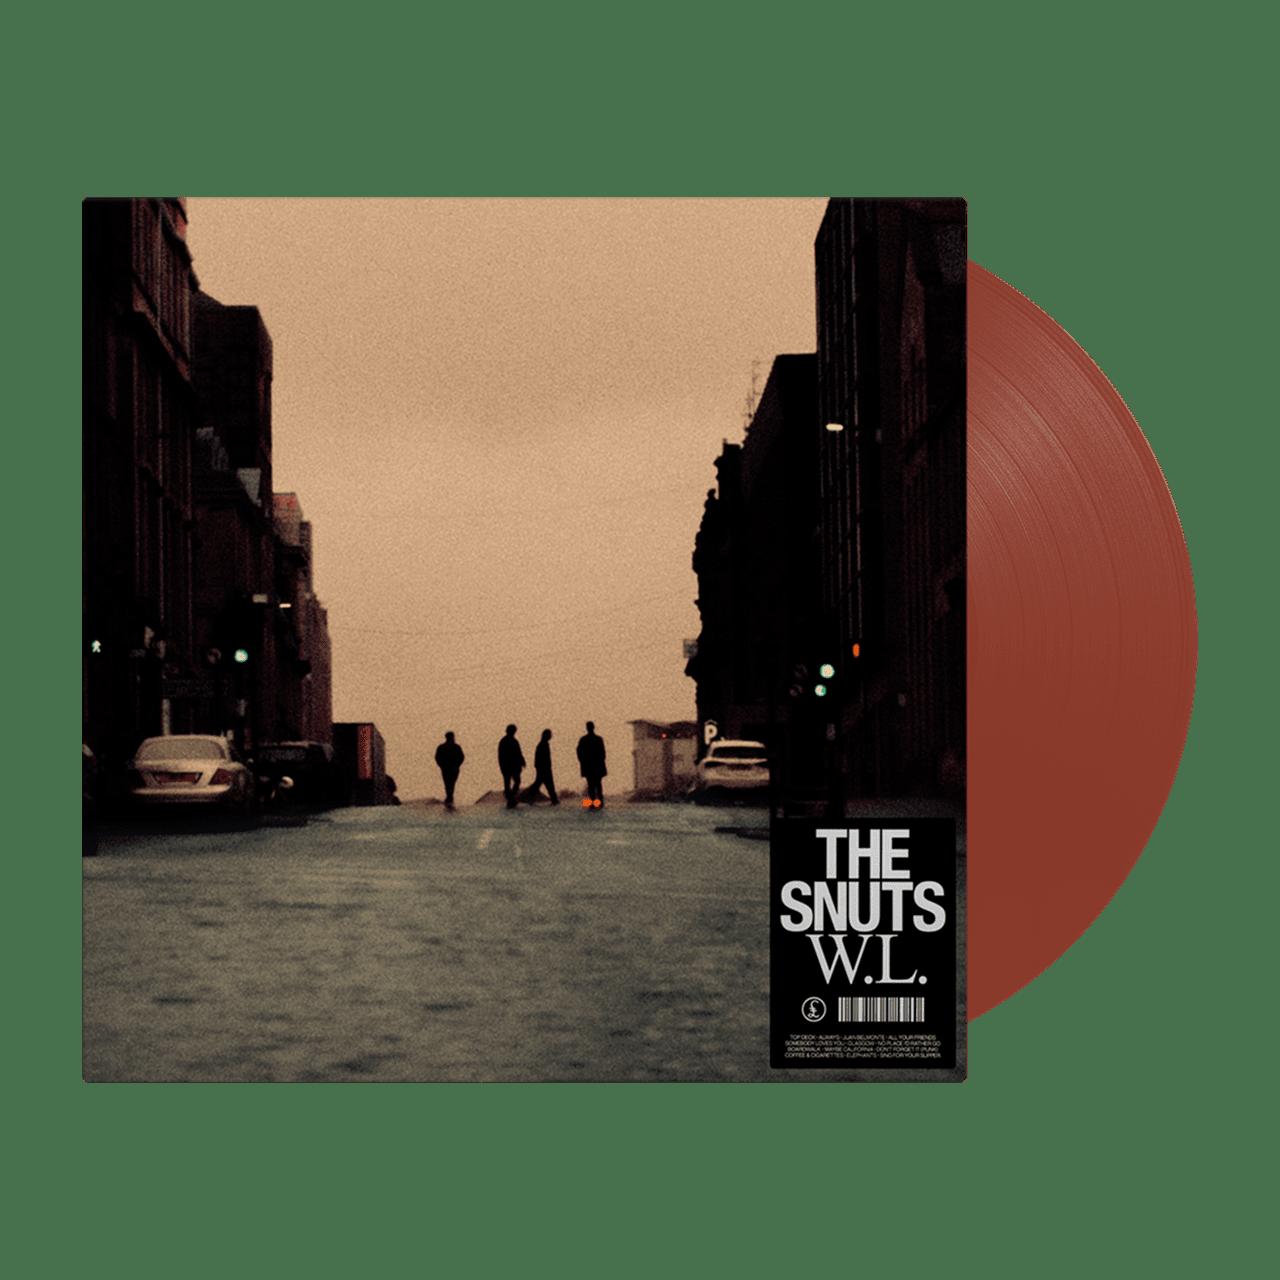 W.L. - Limited Edition Brick Red Vinyl - 1